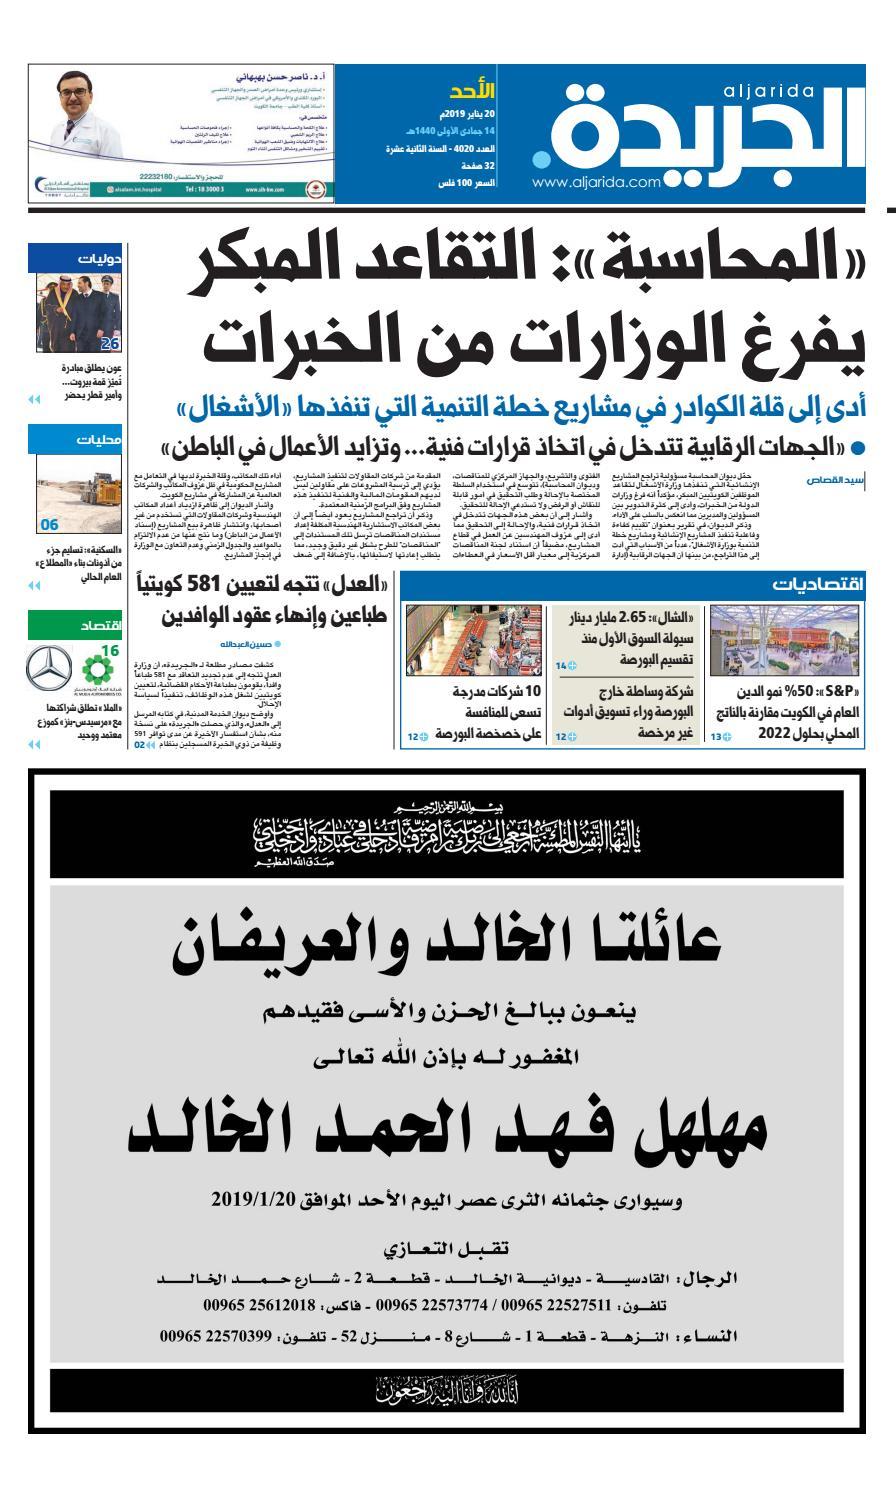 31db65ba3 عدد الجريدة الأحد 20 يناير 2019 by Aljarida Newspaper - issuu